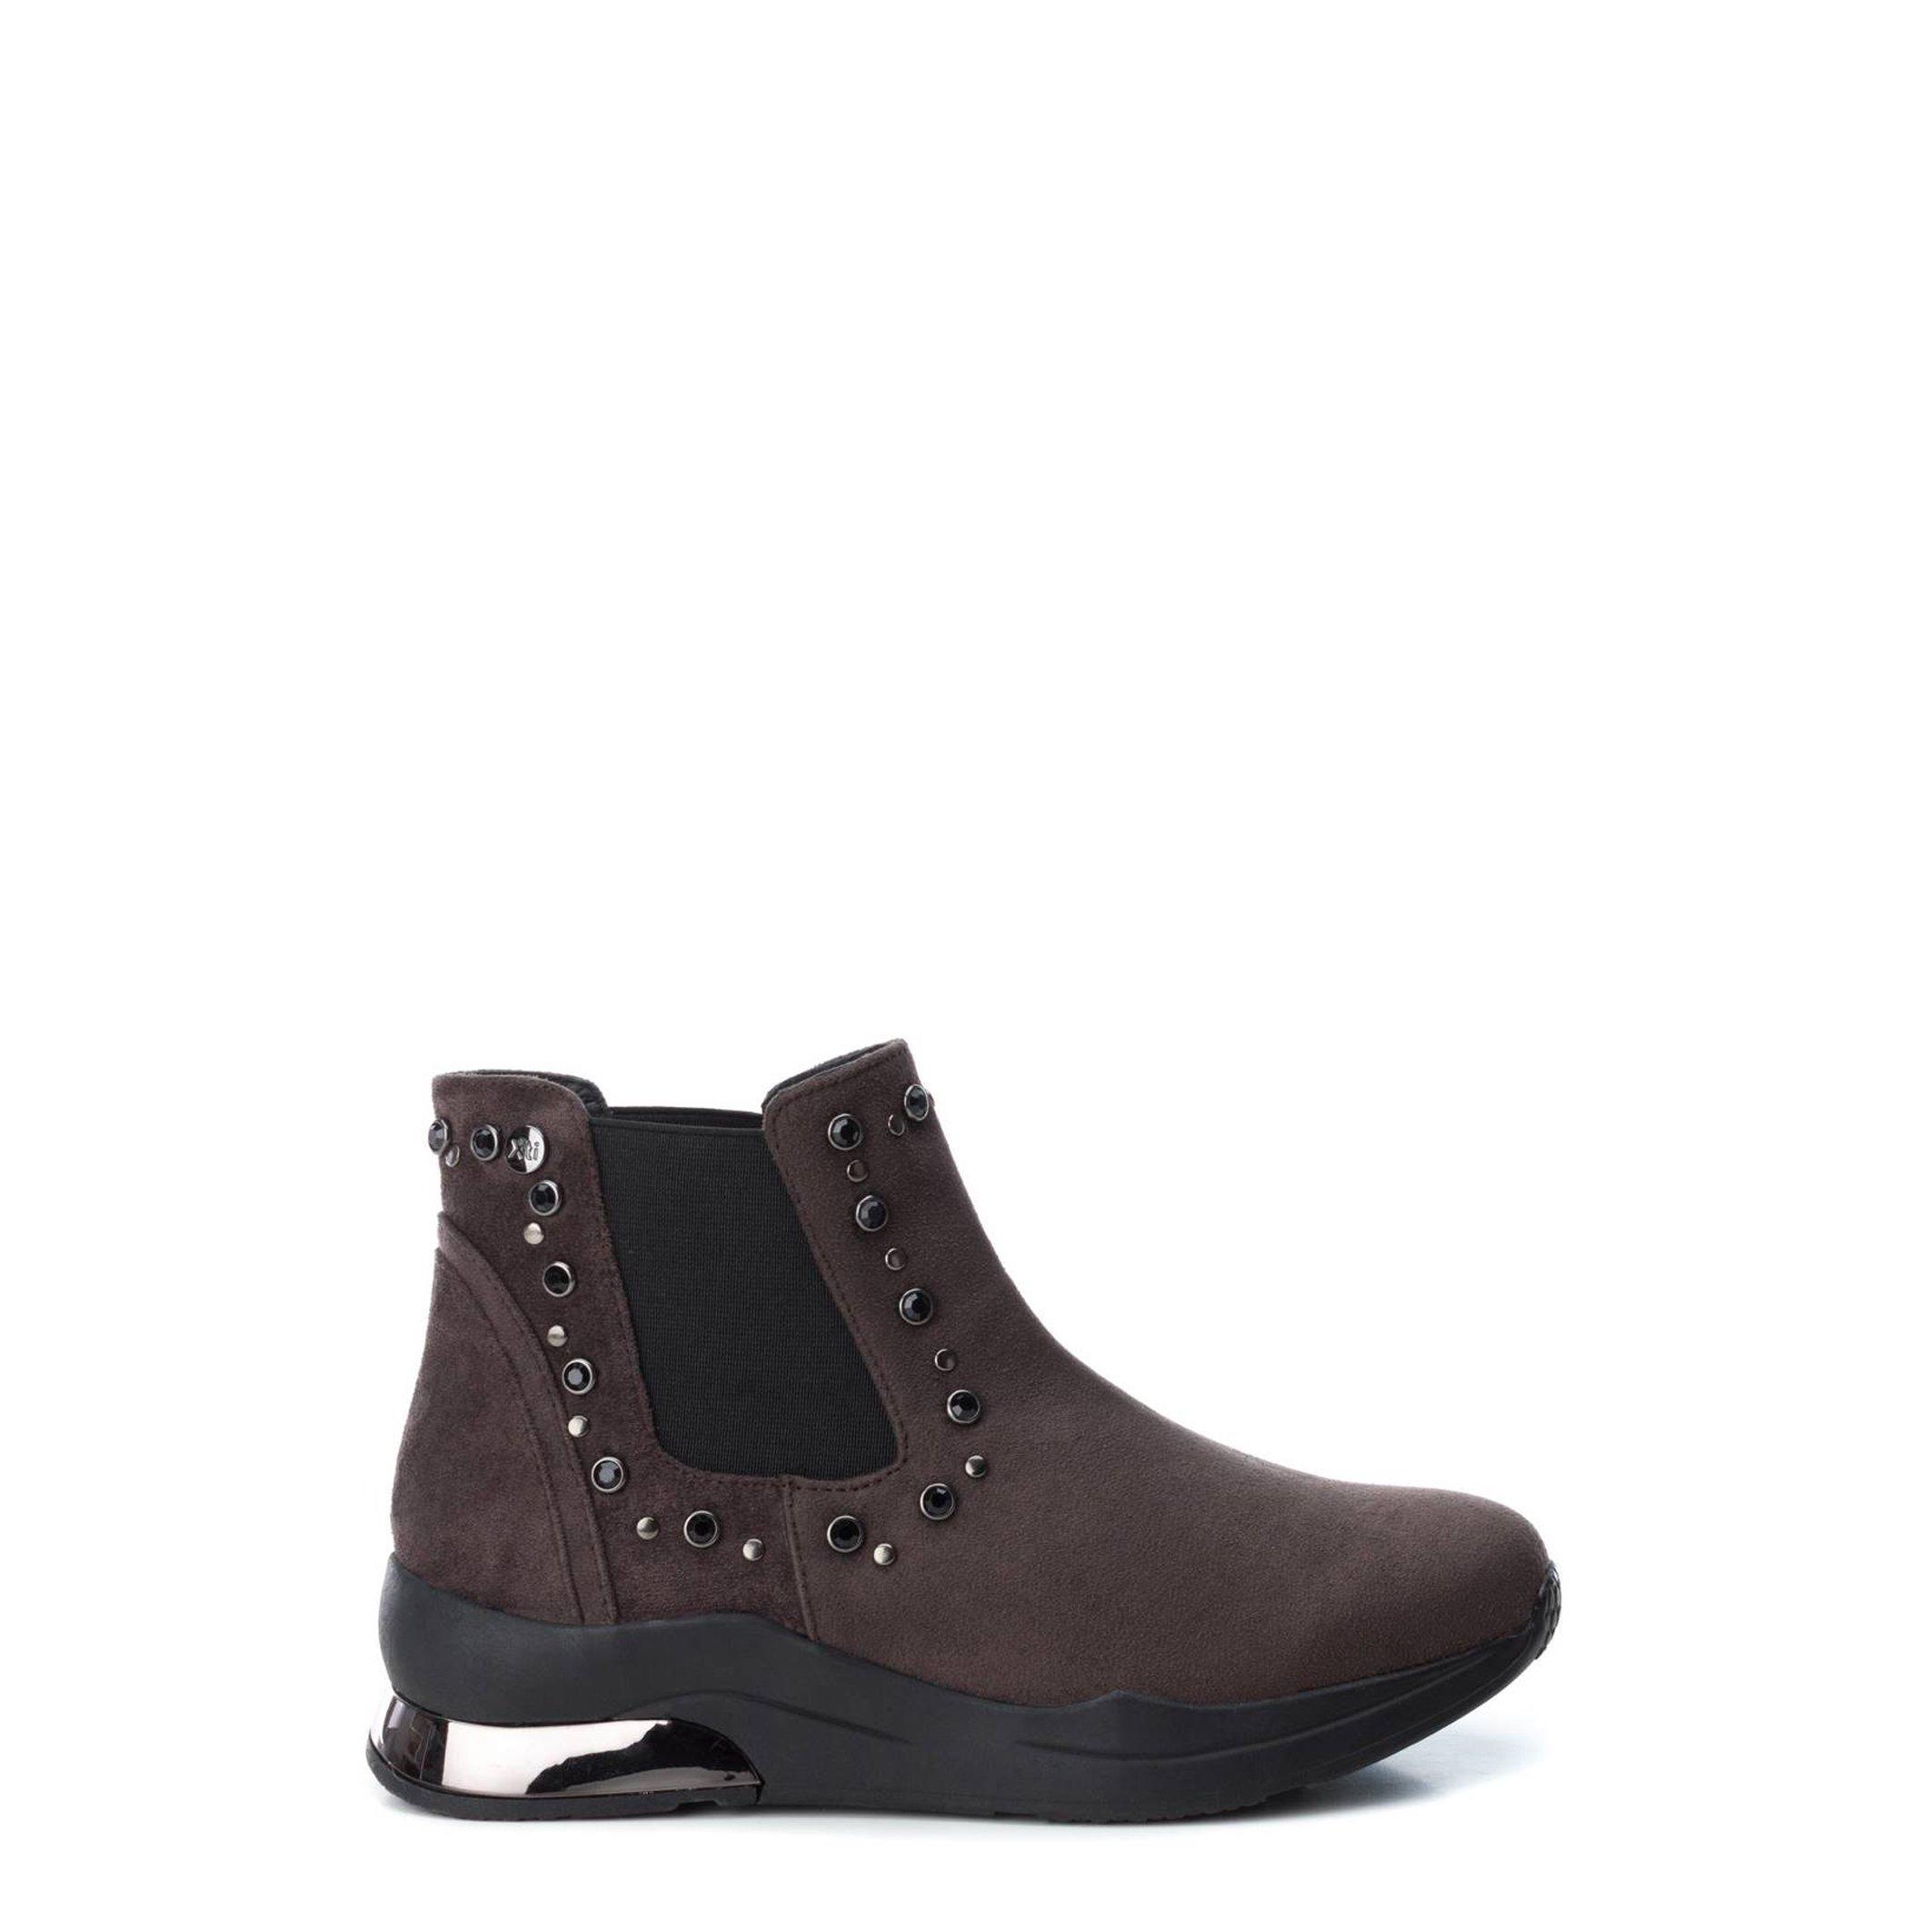 Xti Women's Winter Boots Multicolor 49357 - grey EU 36